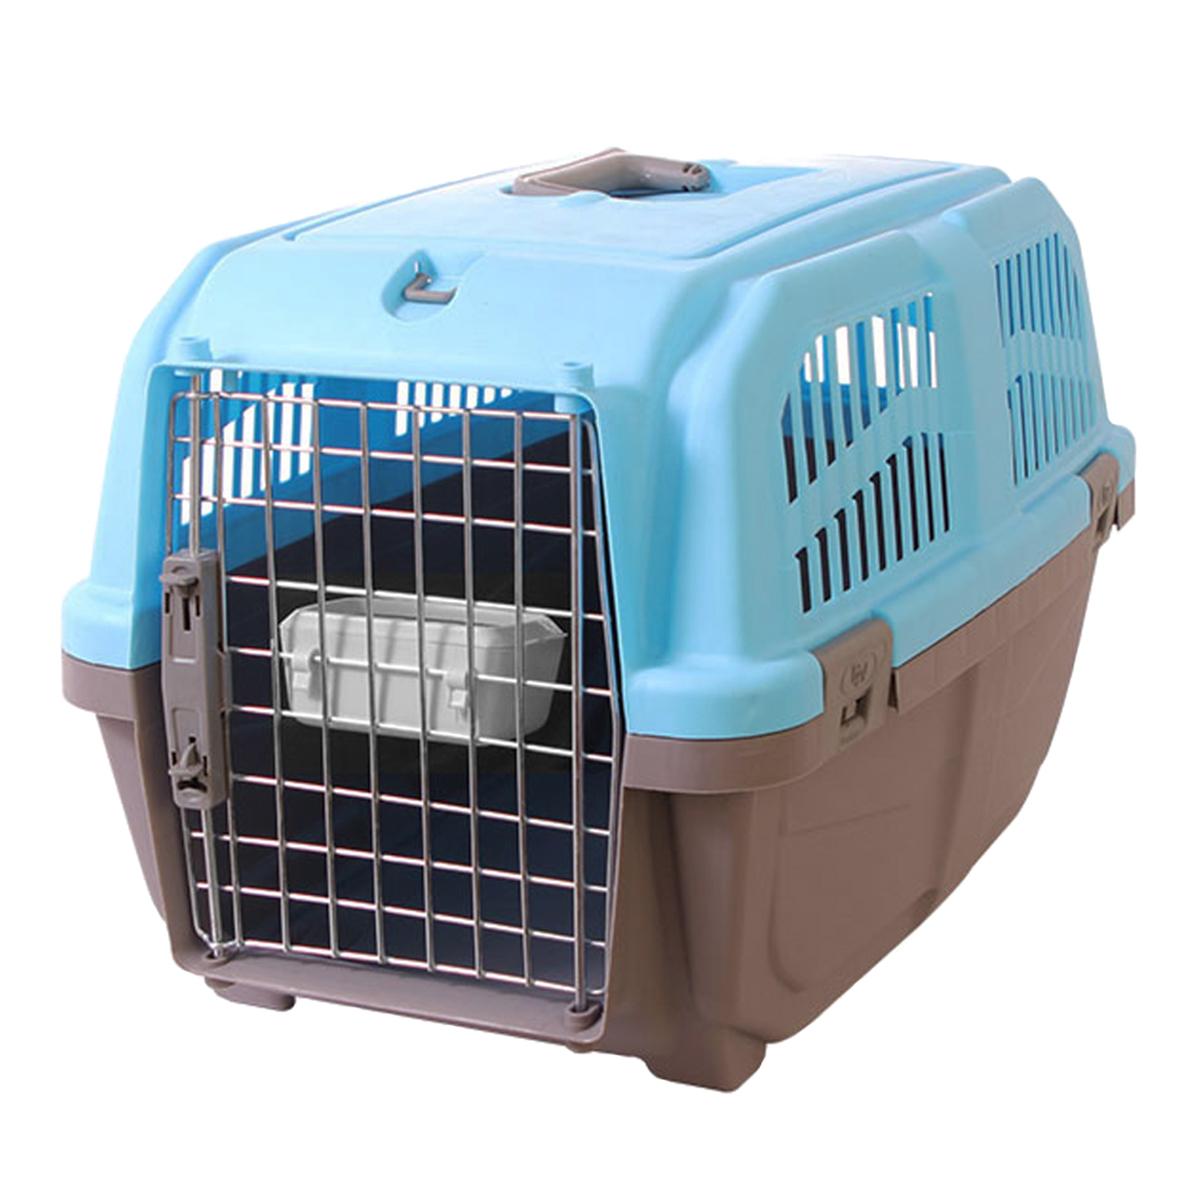 باکس حمل سگ و گربه مدل پانیتو کد 01